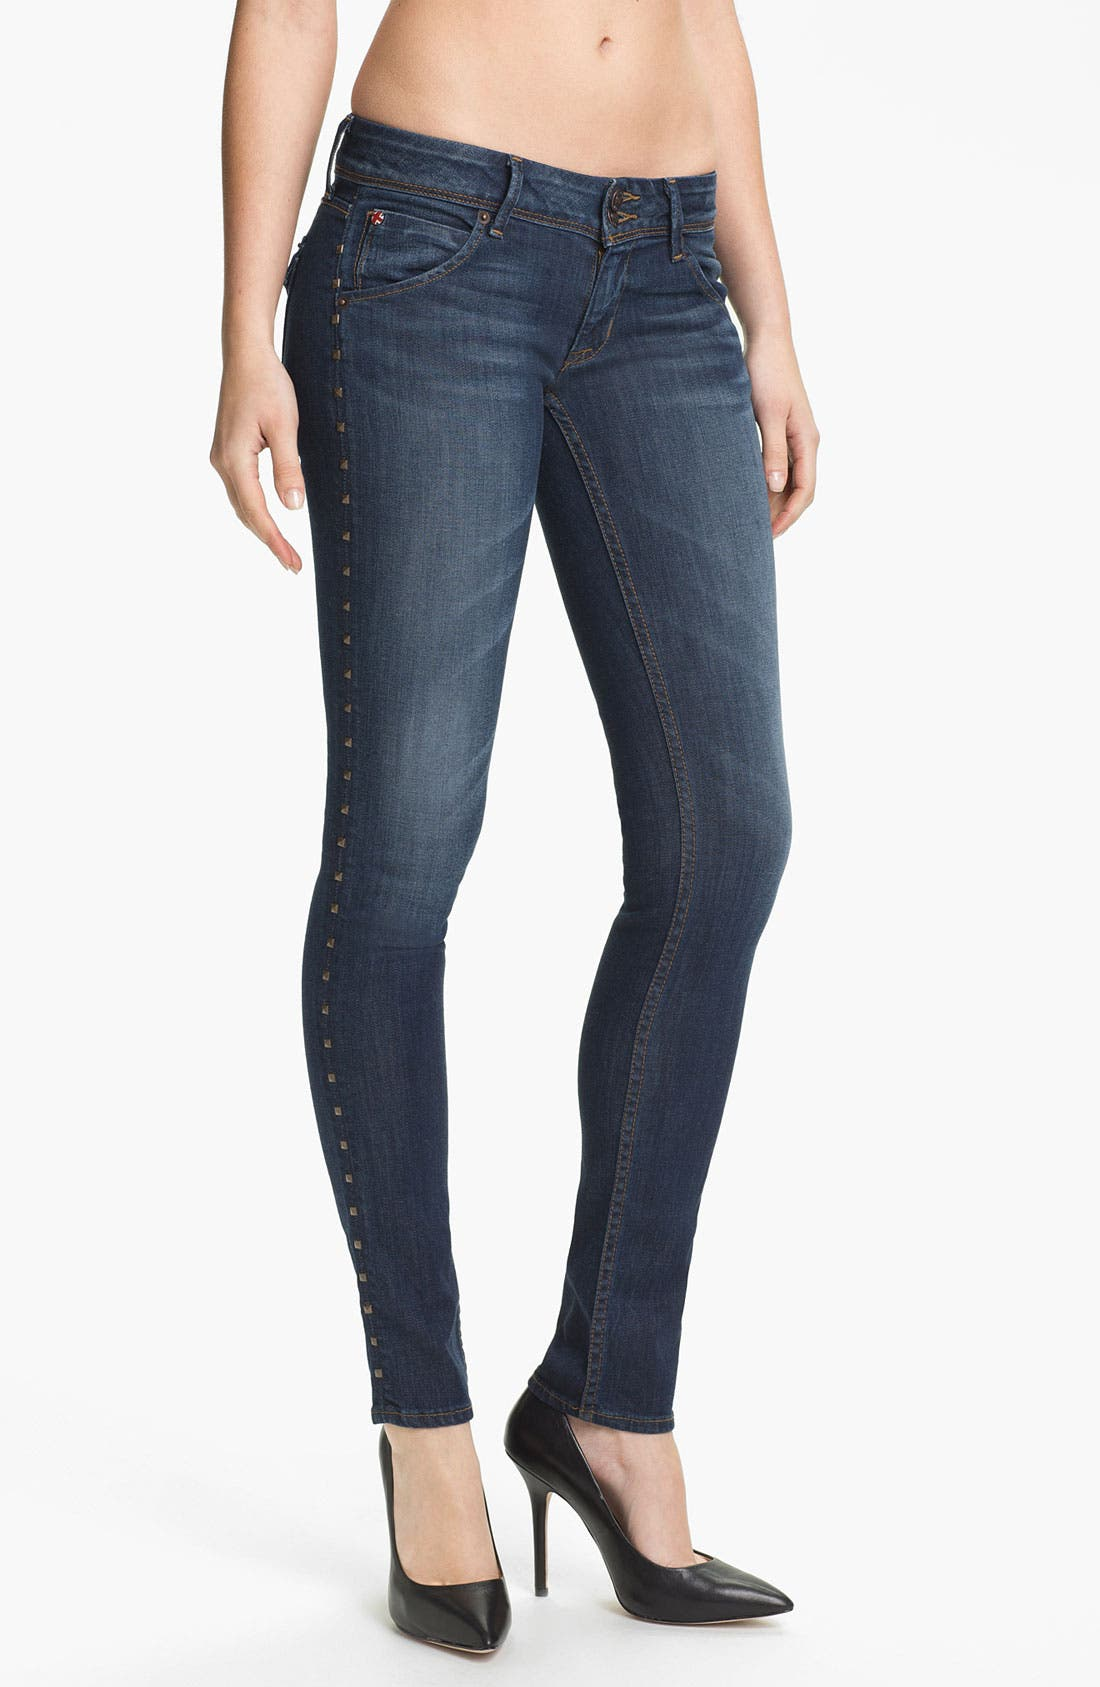 Main Image - Hudson Jeans 'Collin' Skinny Stretch Jeans (Bennett)